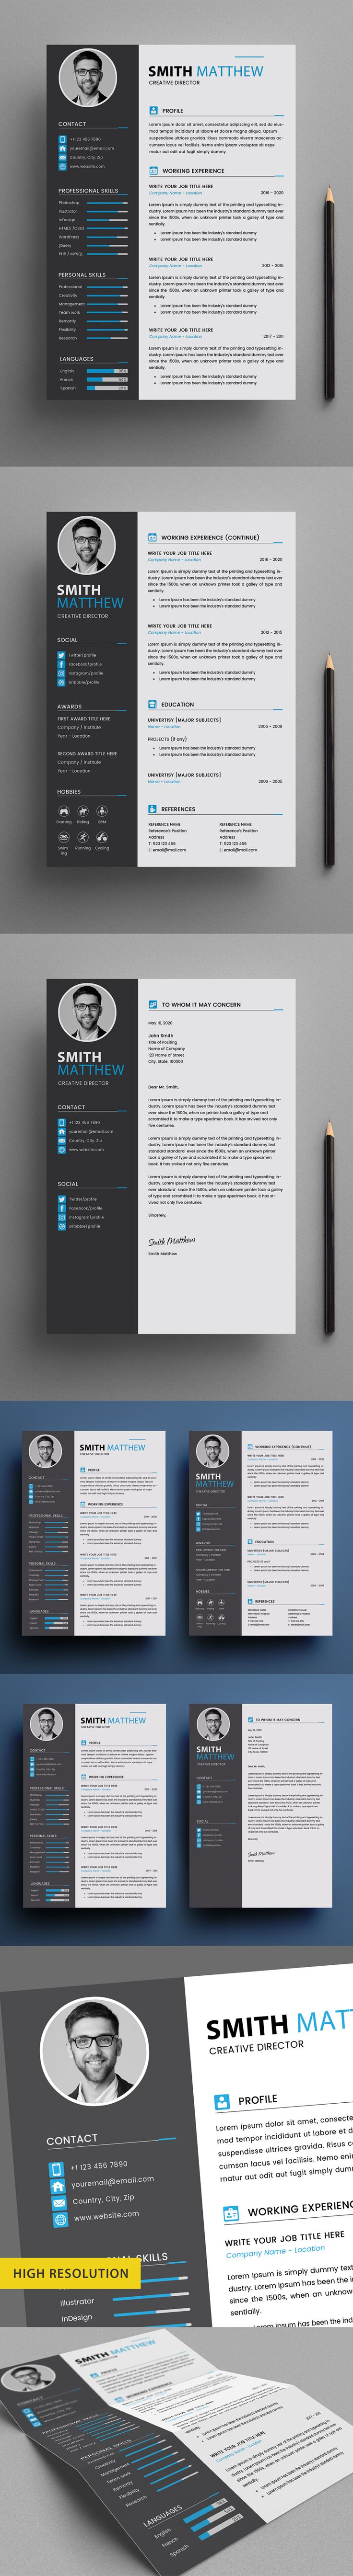 Free CV Resume Templates + Cover Letter (PSD) in 2020 Cv